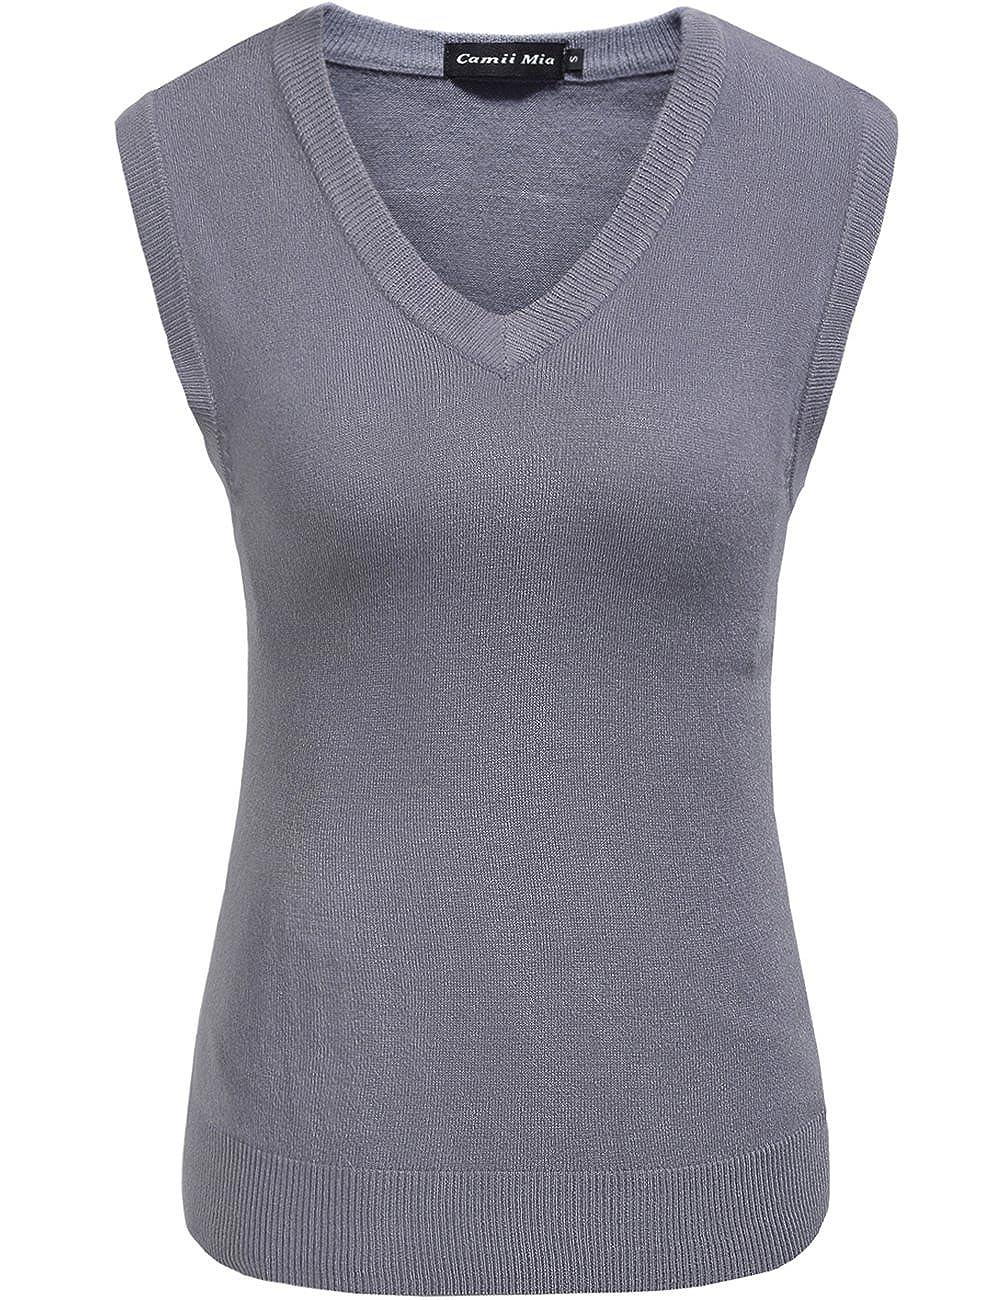 Camii Mia Women's V-Neck Sweater Vest Knitwear Pullover Tank Tops